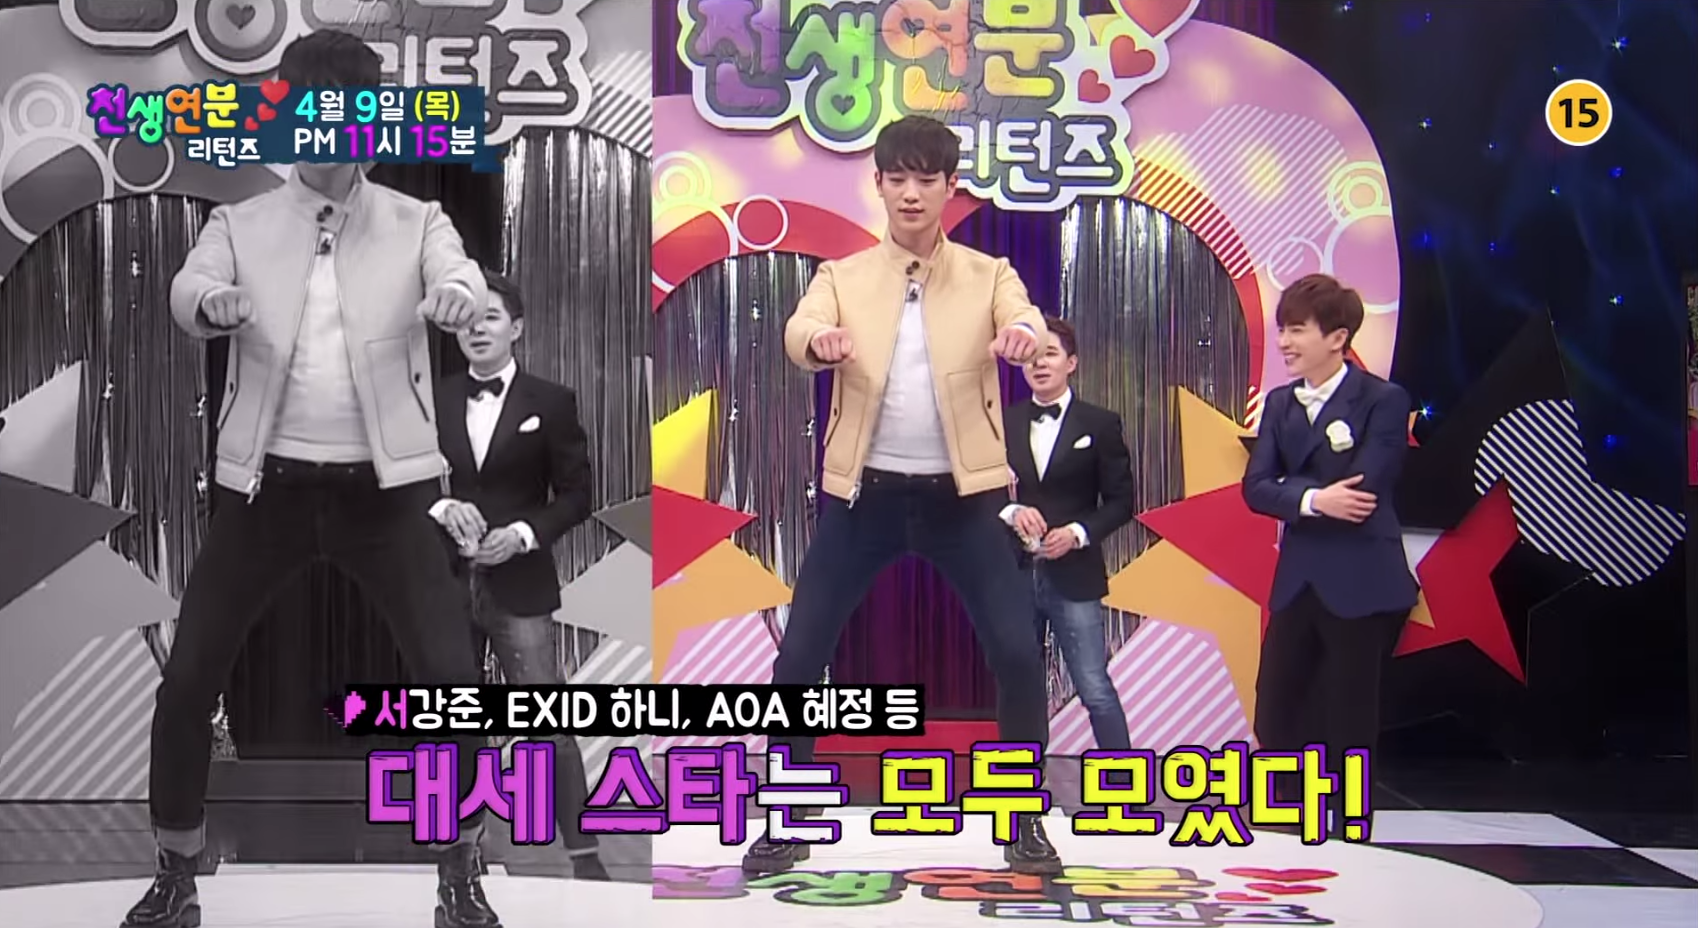 seo kang joon dance match made in heaven